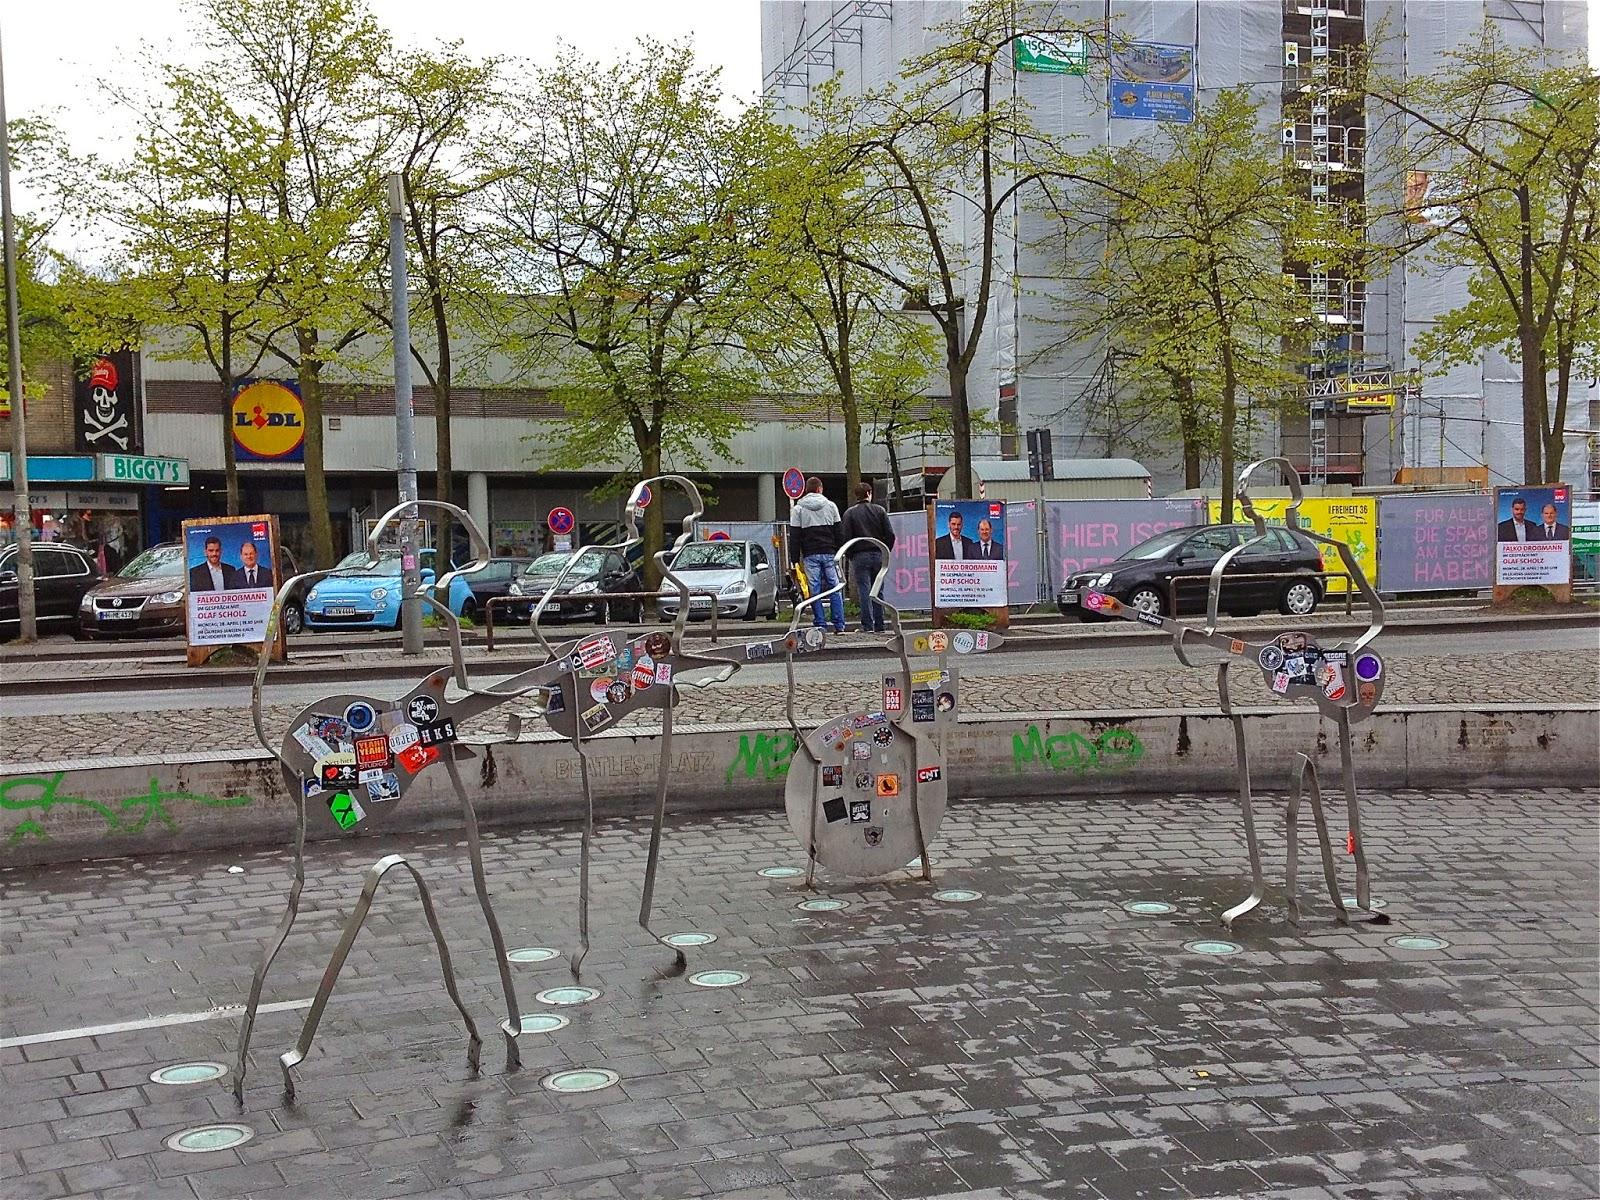 Picture of the Beatles memorial in St Pauli, Hamburg.